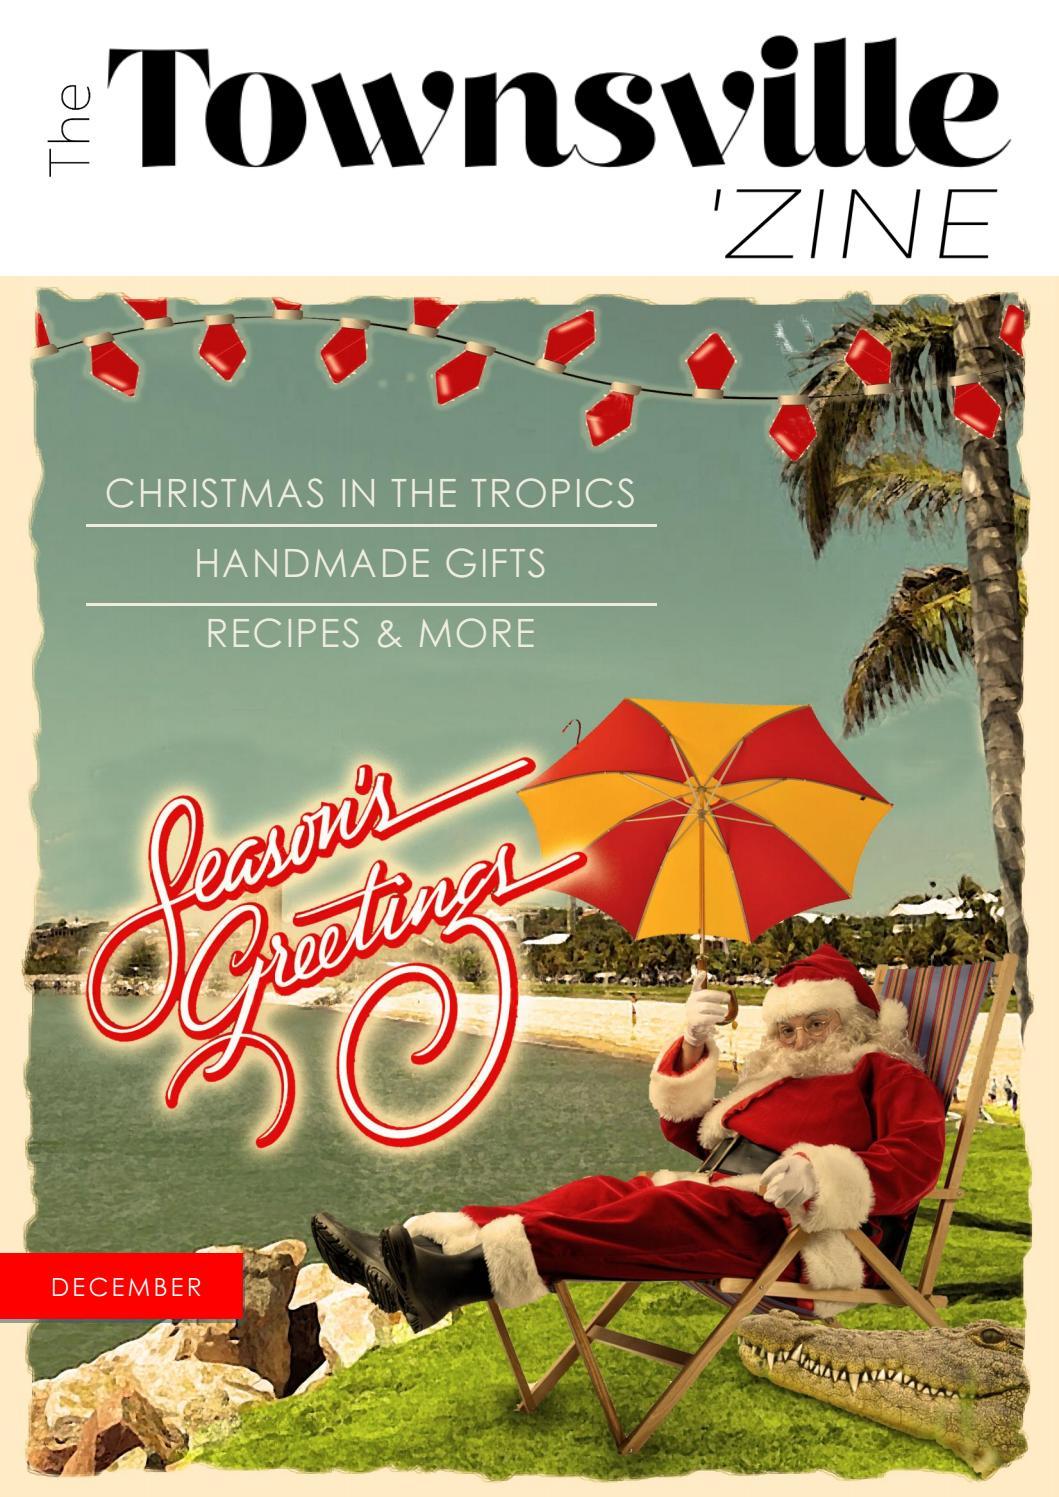 The Townsville Zine December By Issuu